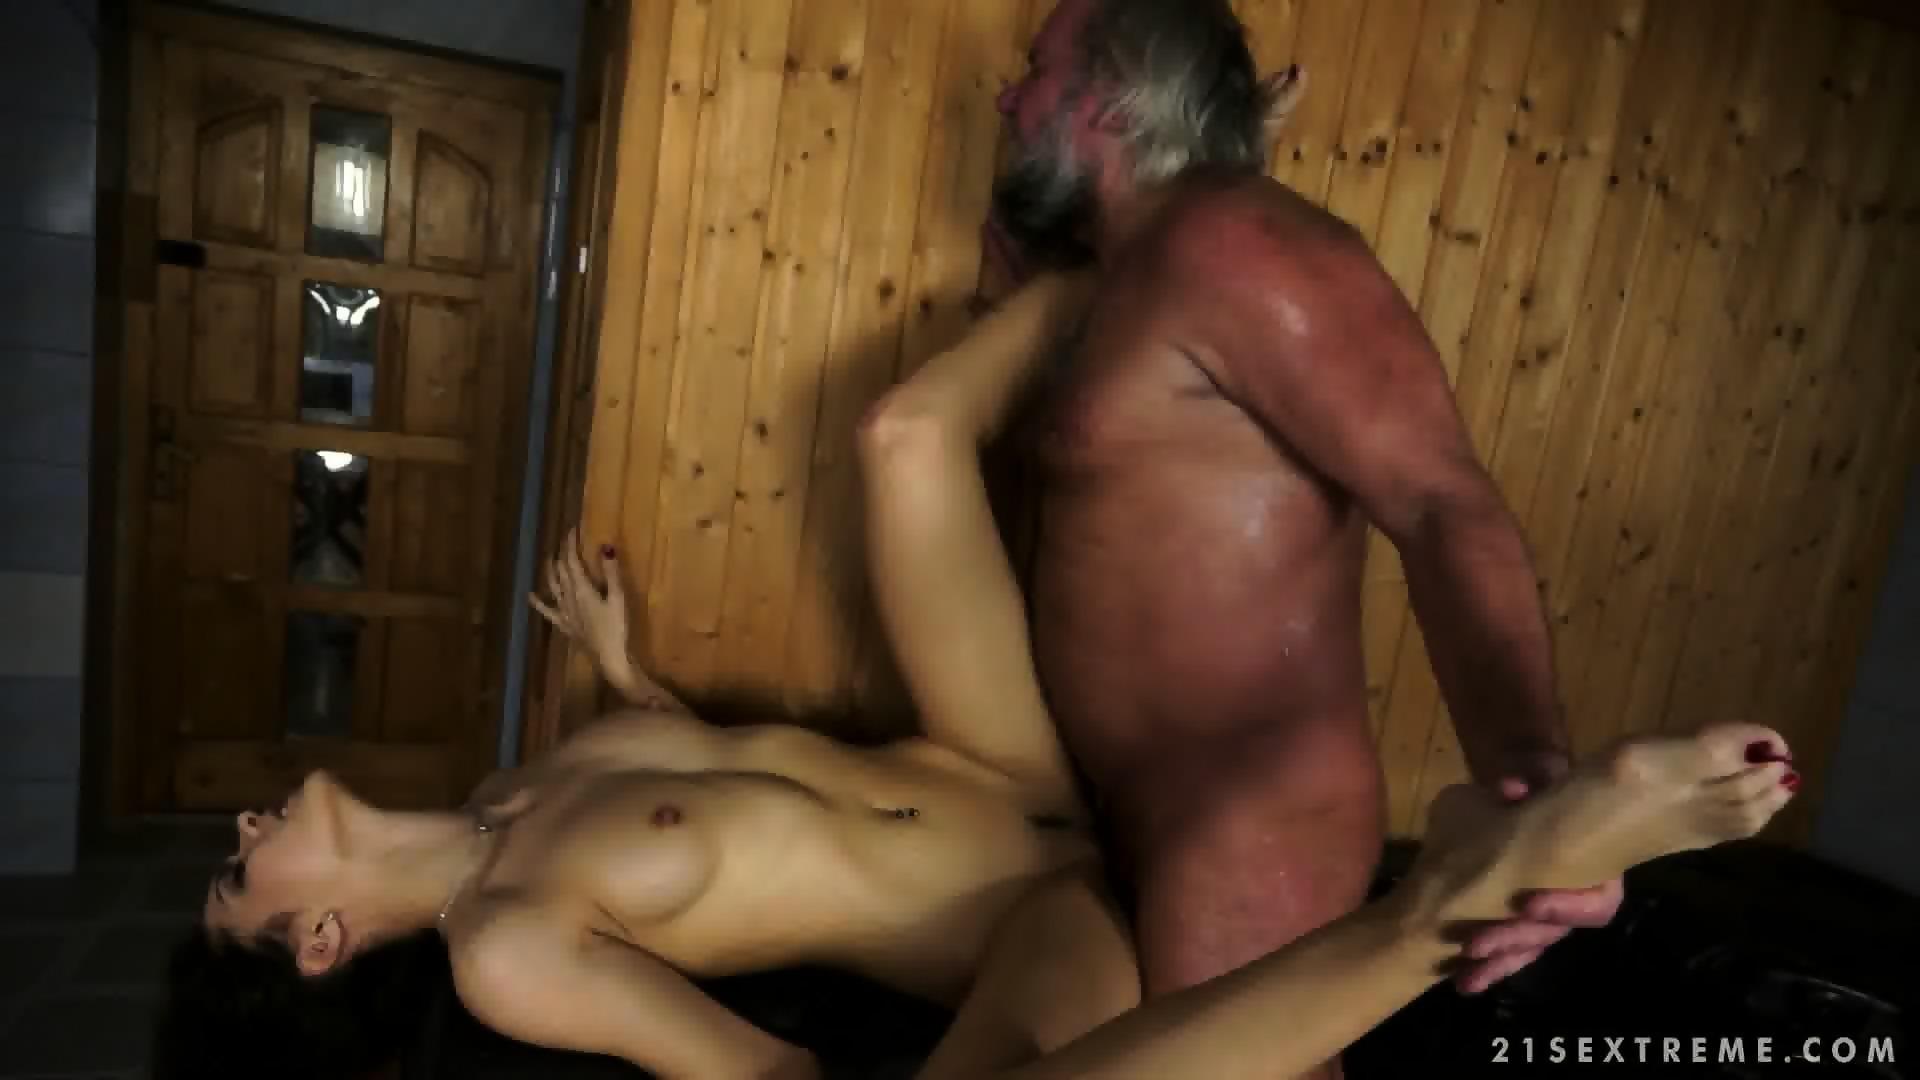 girls sex nude gif